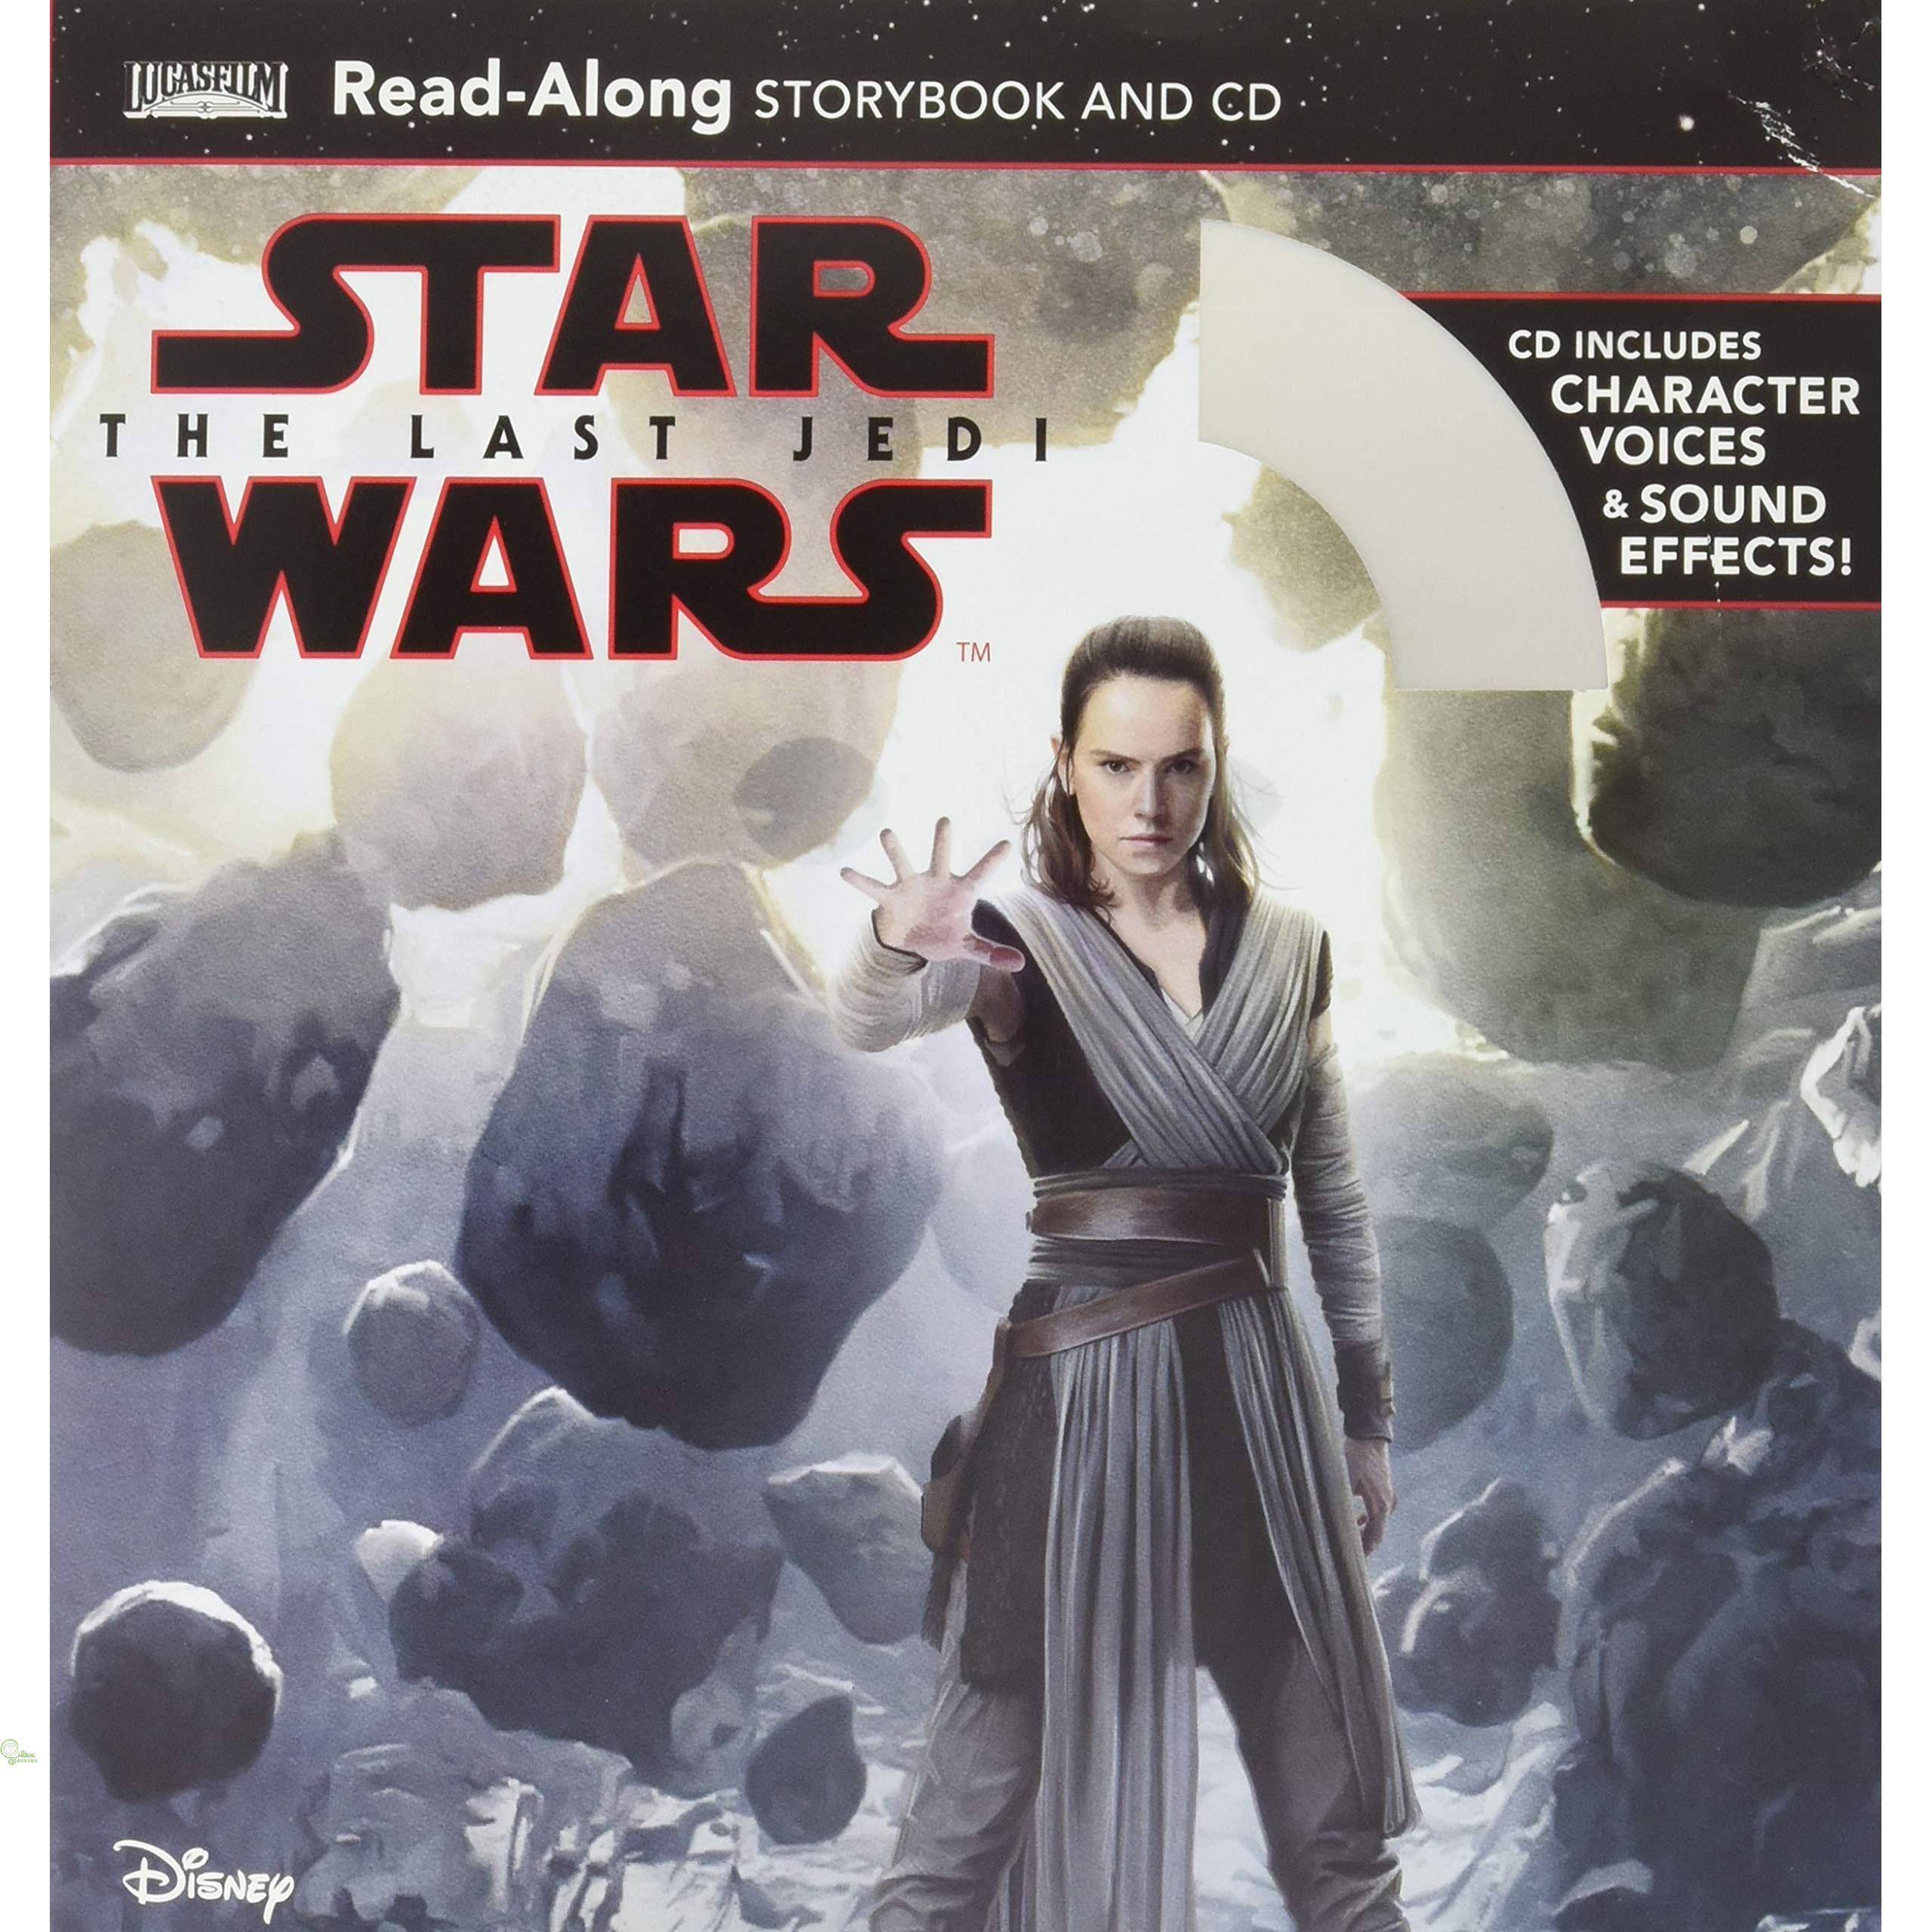 Star Wars - the Last Jedi (1平裝+1CD)【禮筑外文書店】(有聲書)[79折]